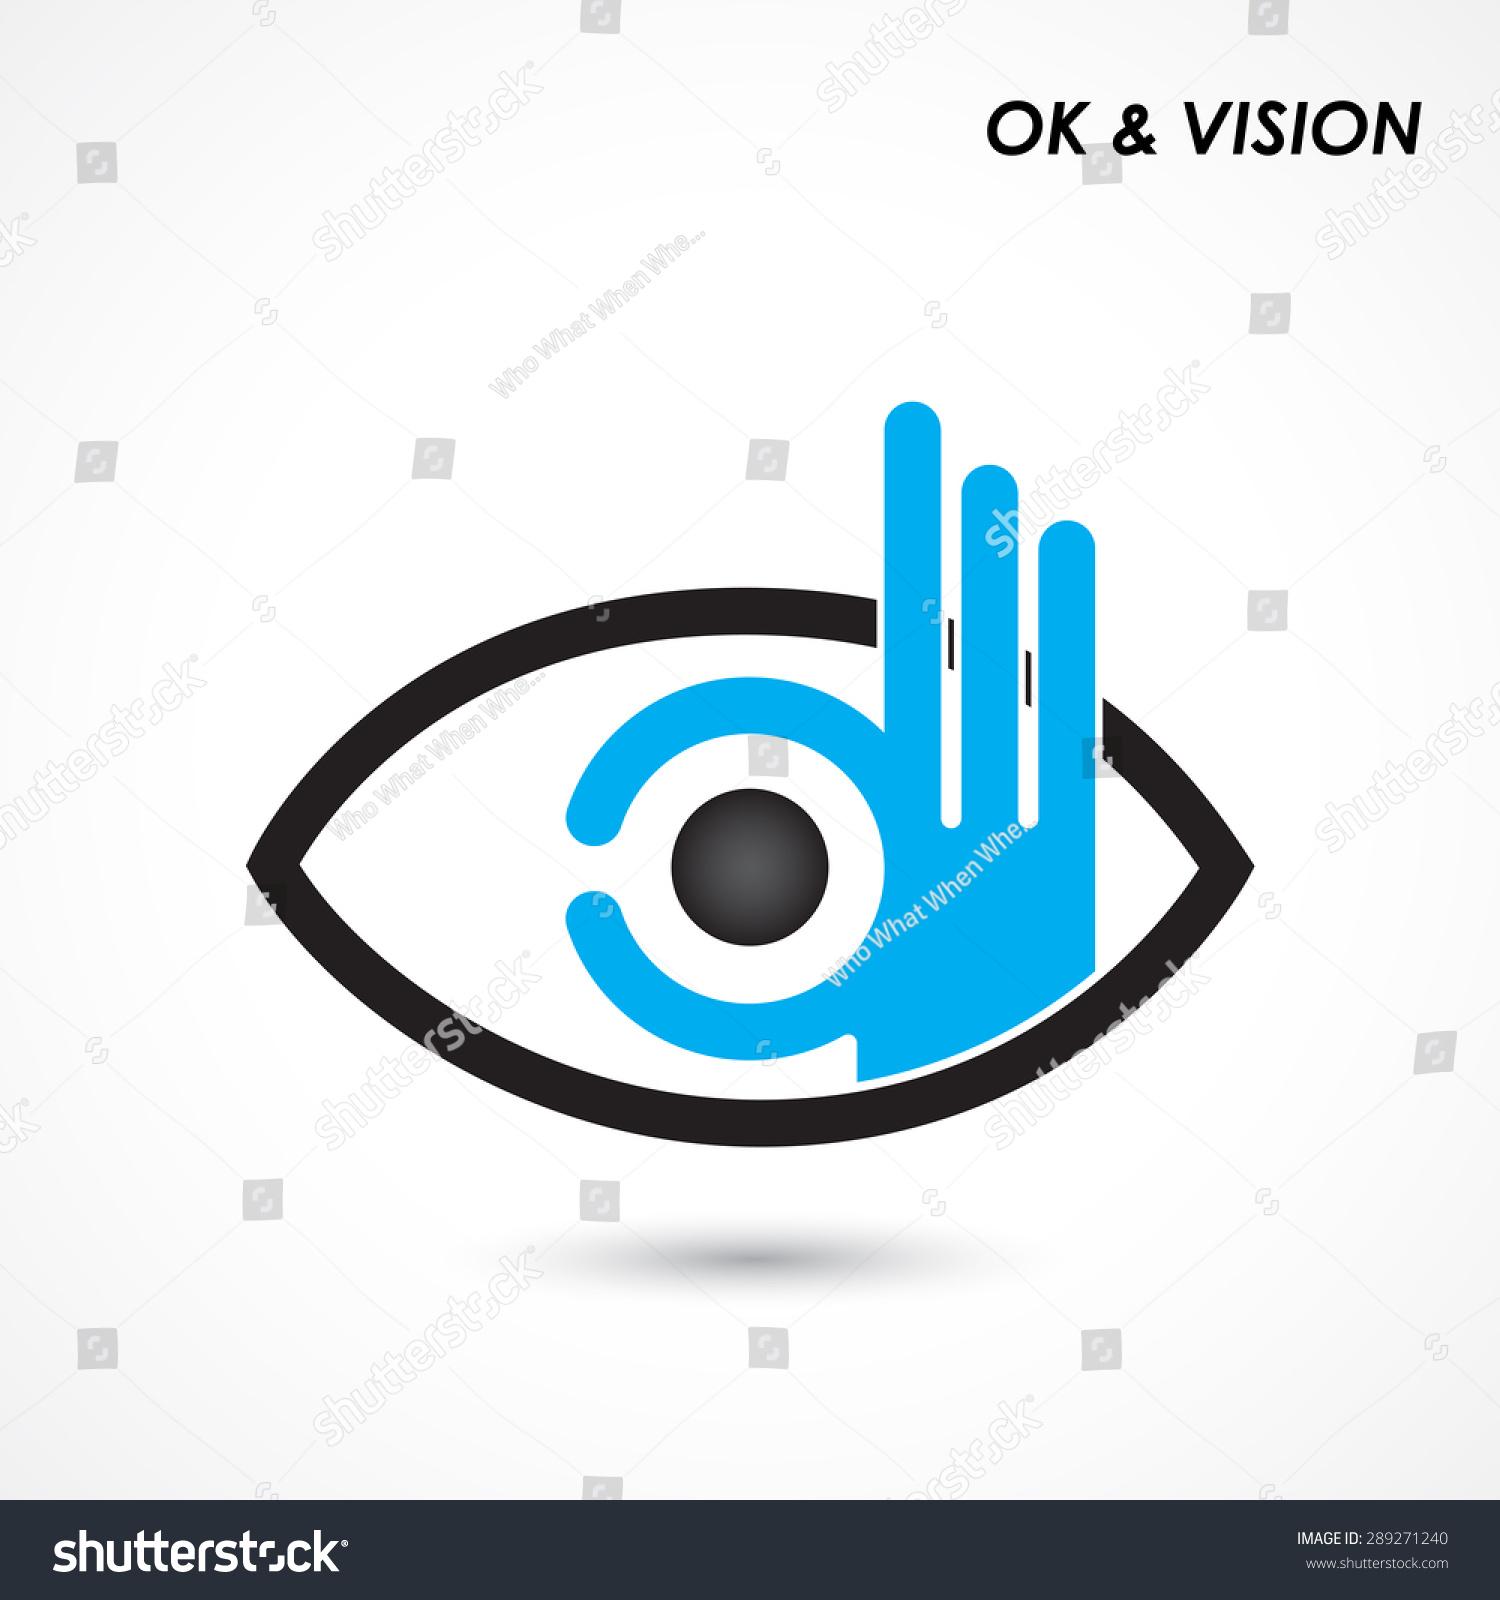 Ok Hand Eye Sign Business Vision Stock Vector 289271240 ...